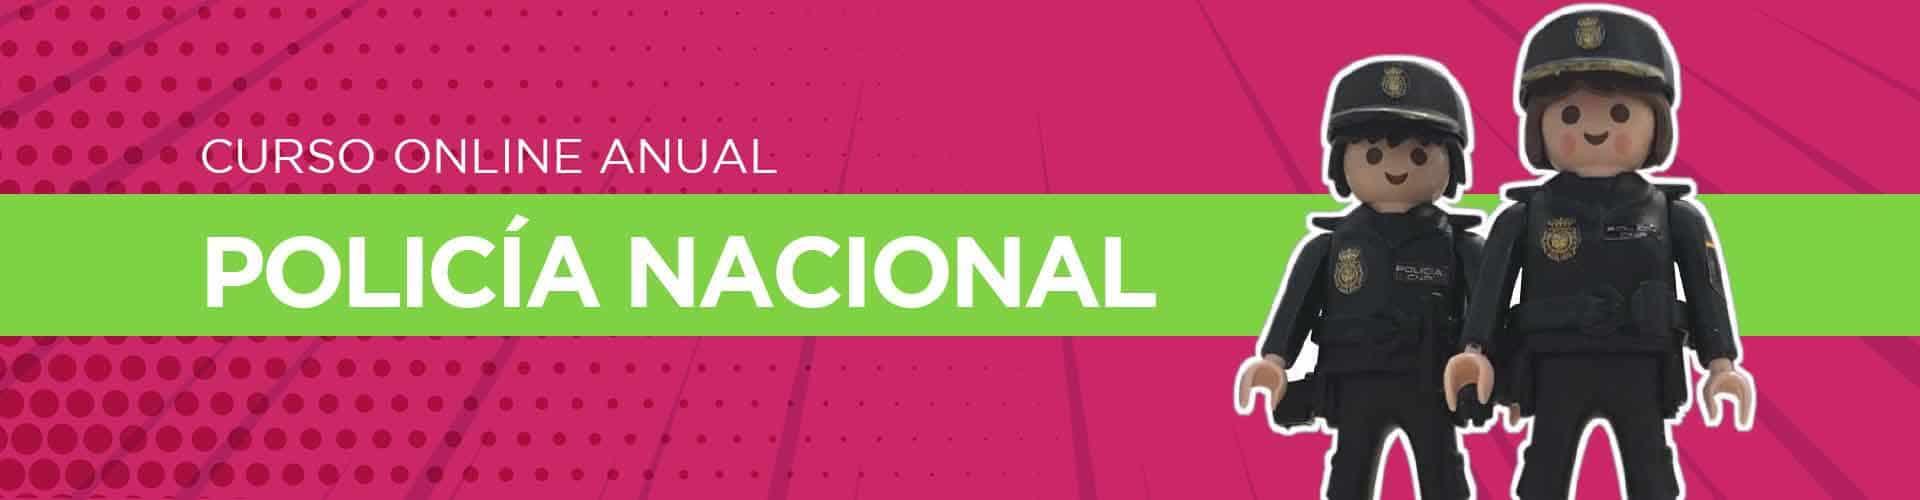 Academia de Policía Nacional online Fonseca